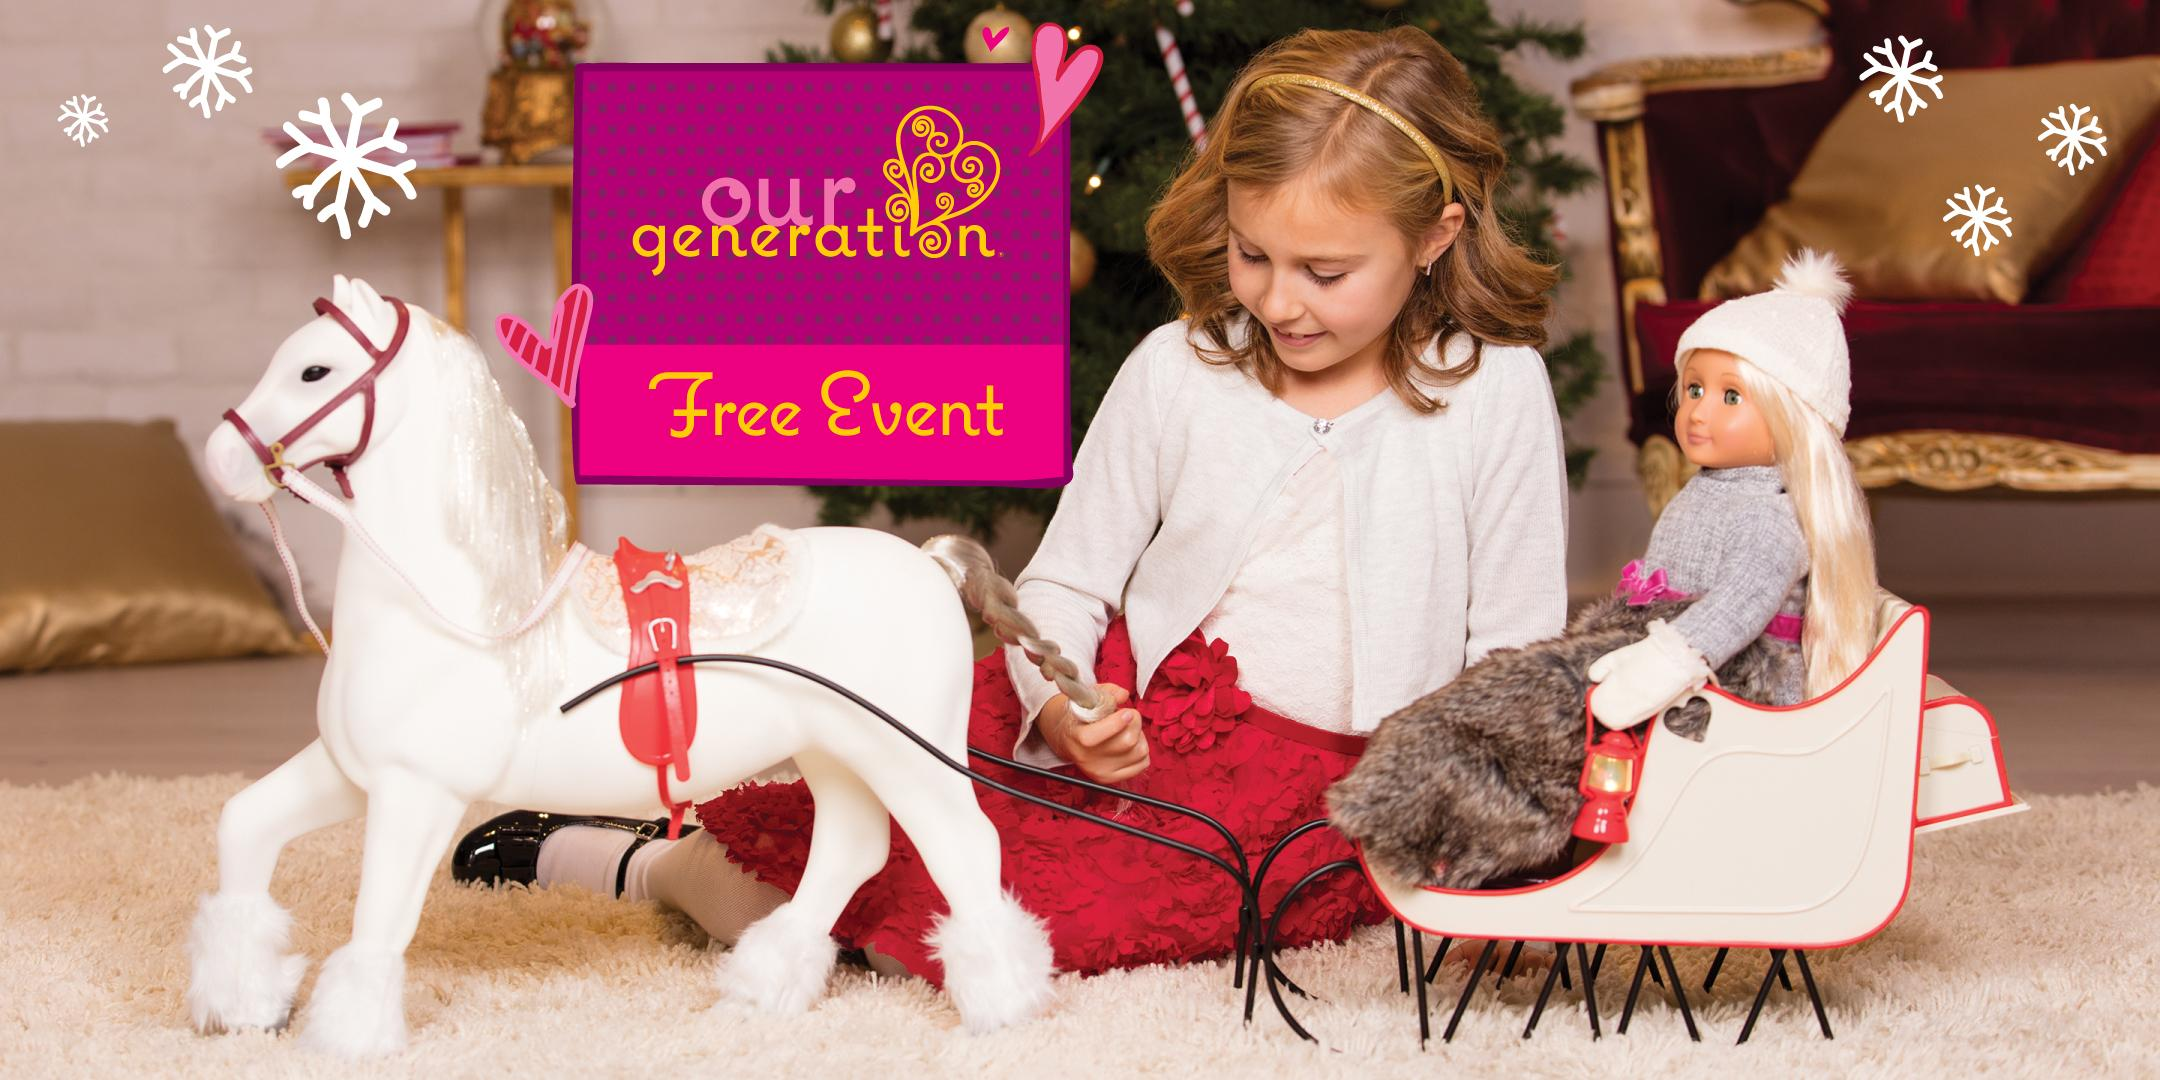 Free Holiday Event for Kids - Target San Antonio (Loop), TX